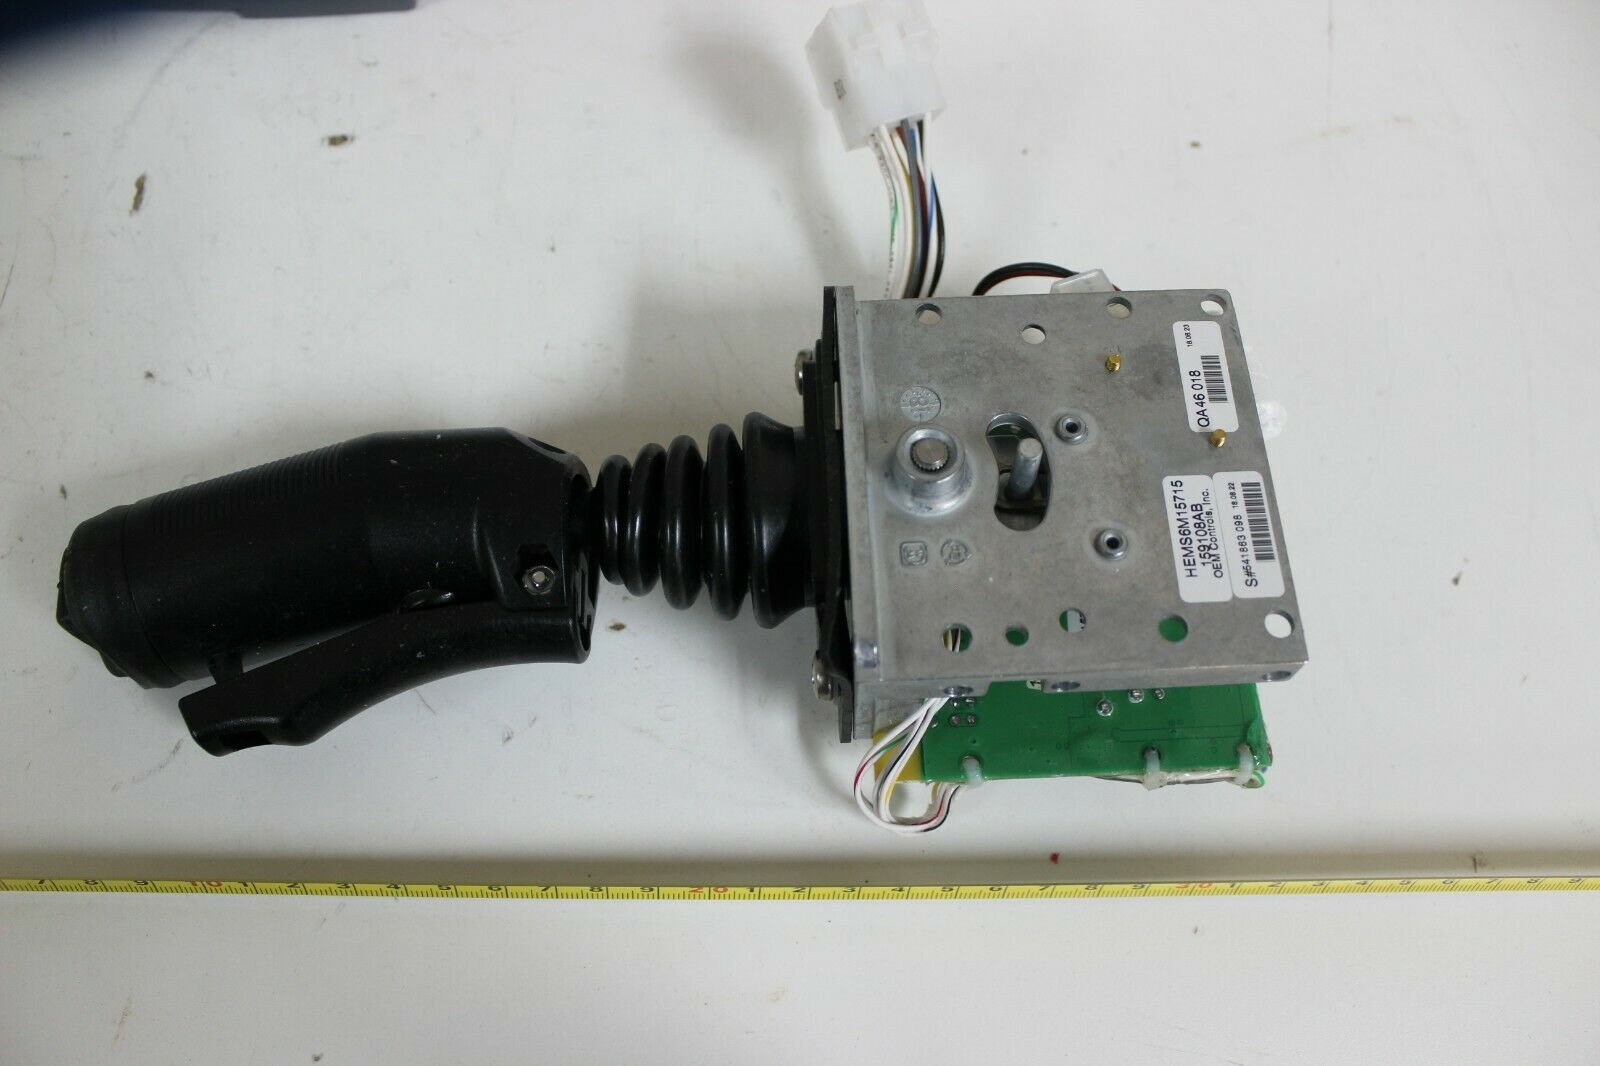 OEM Controls HEMS6M15715, 159108AB MS6 Single Axis Controller Joystick New